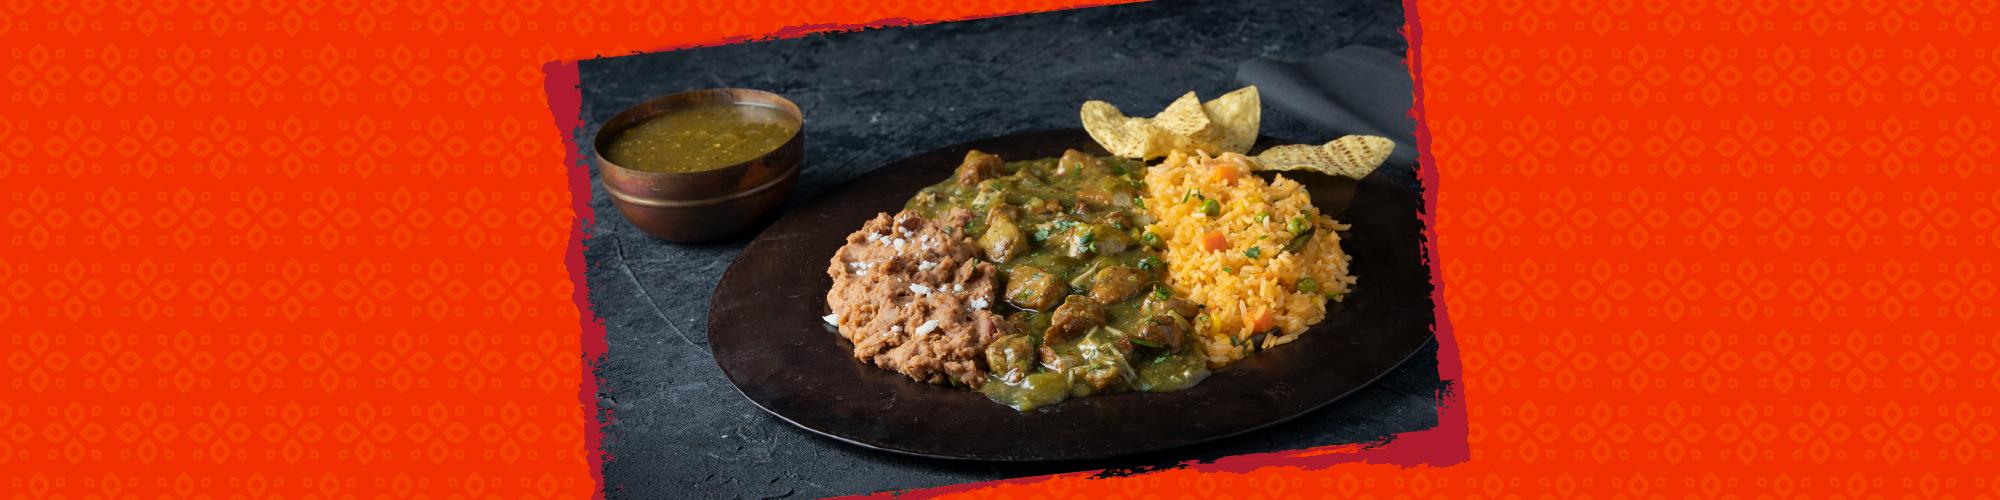 Salsas pork chile verde